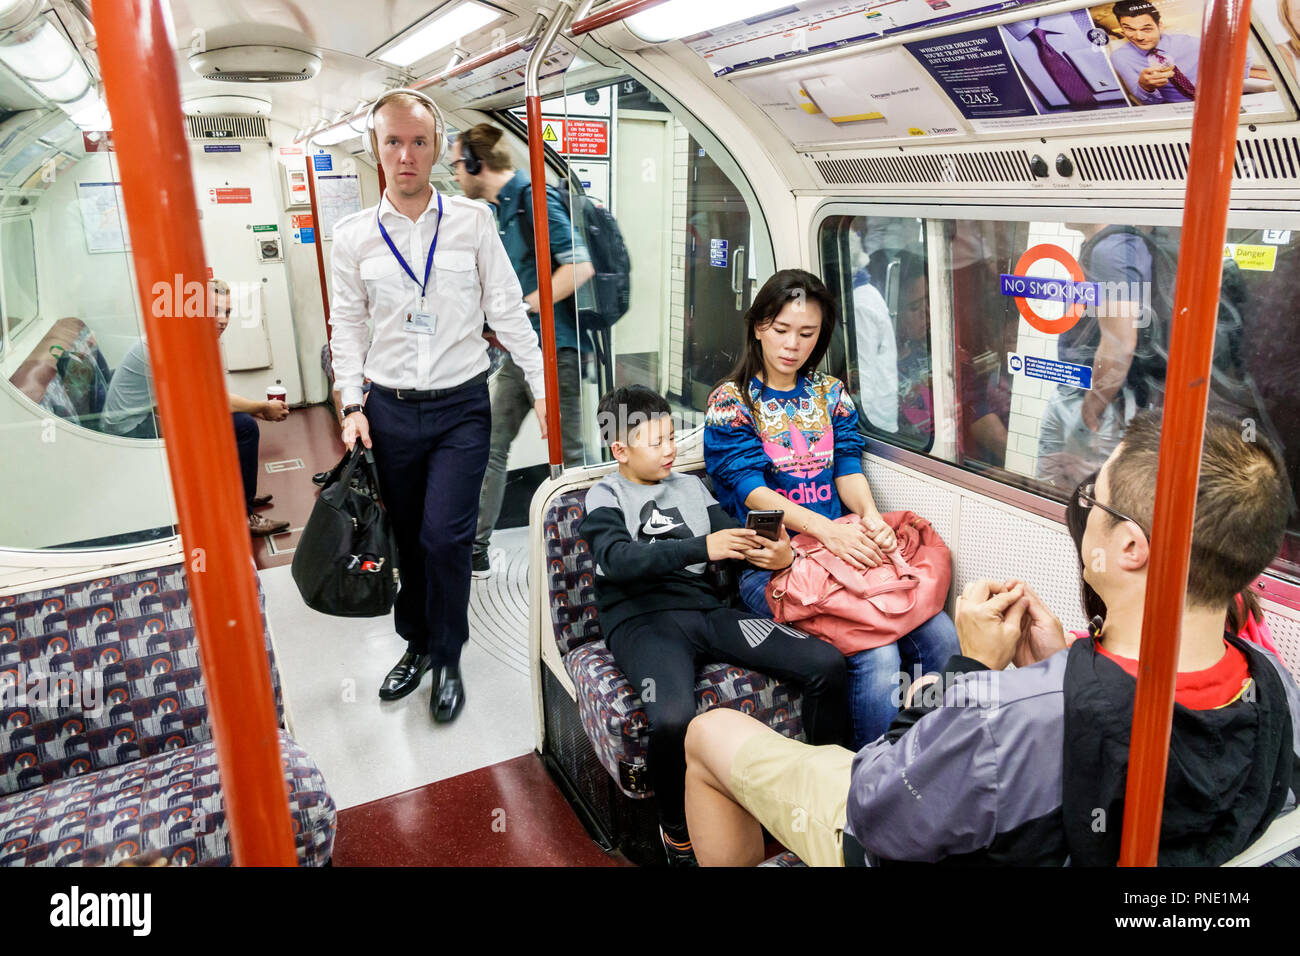 London England Great Britain United Kingdom South Bank Lambeth North Underground Station Subway Tube Public Transportation Mass Transit Train Carriage